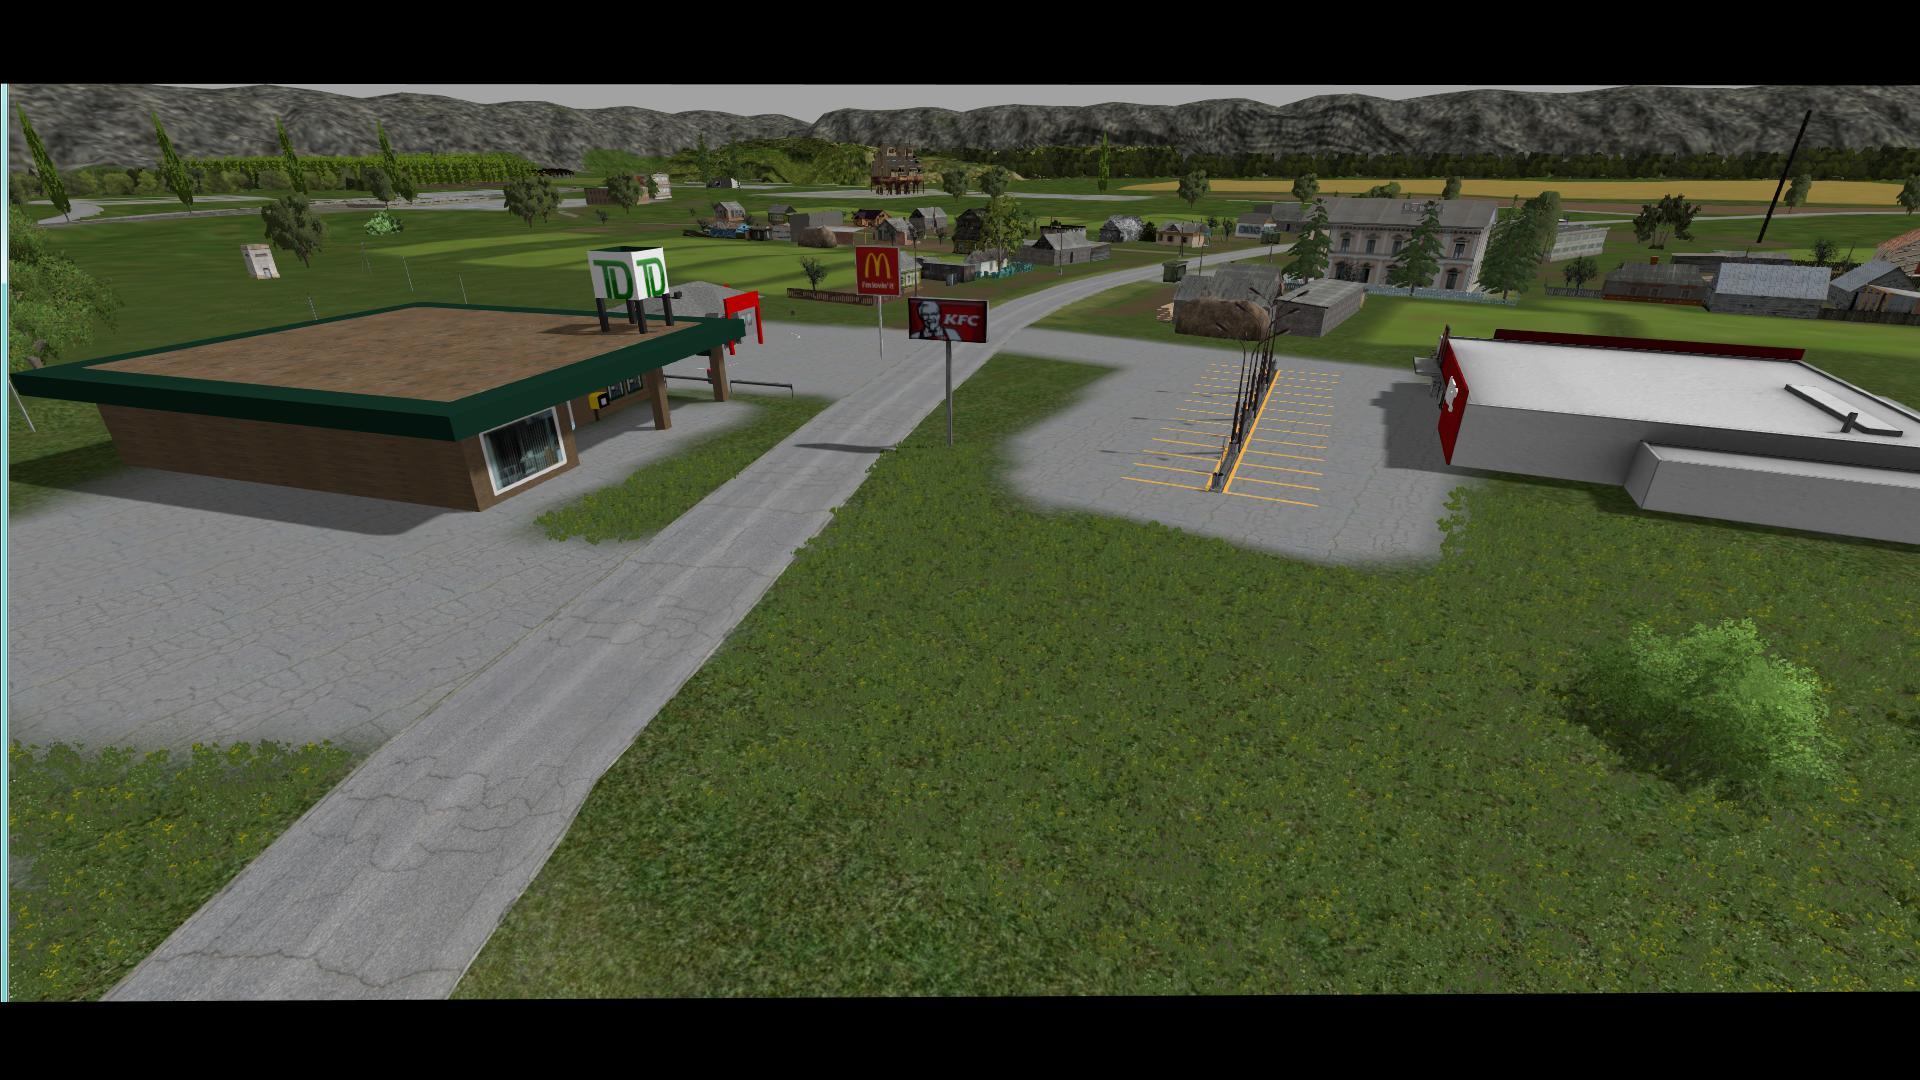 CSI DEERFIELD V1 • Farming simulator 19, 17, 15 mods